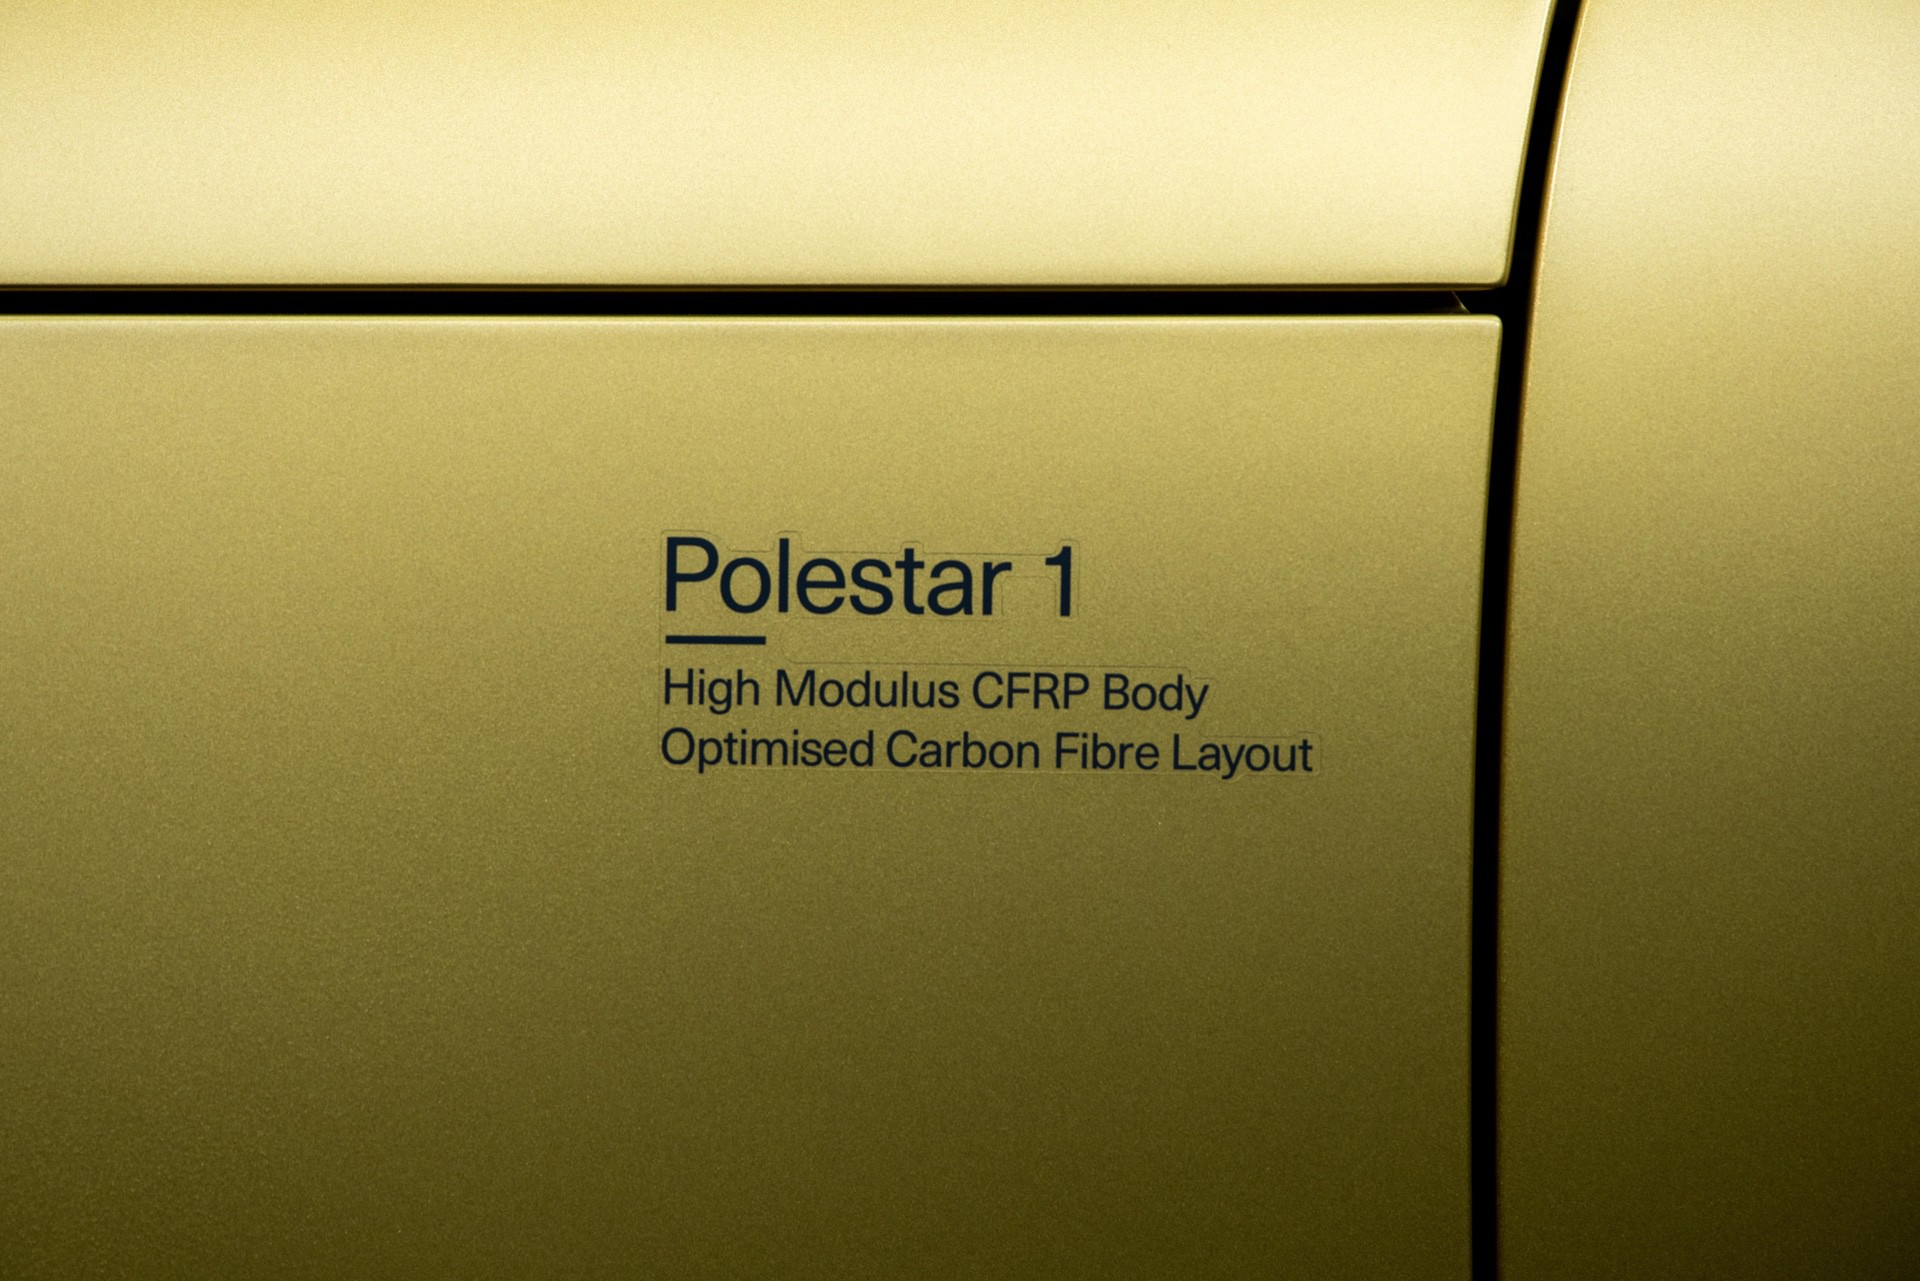 Polestar_1_special_edition-0003